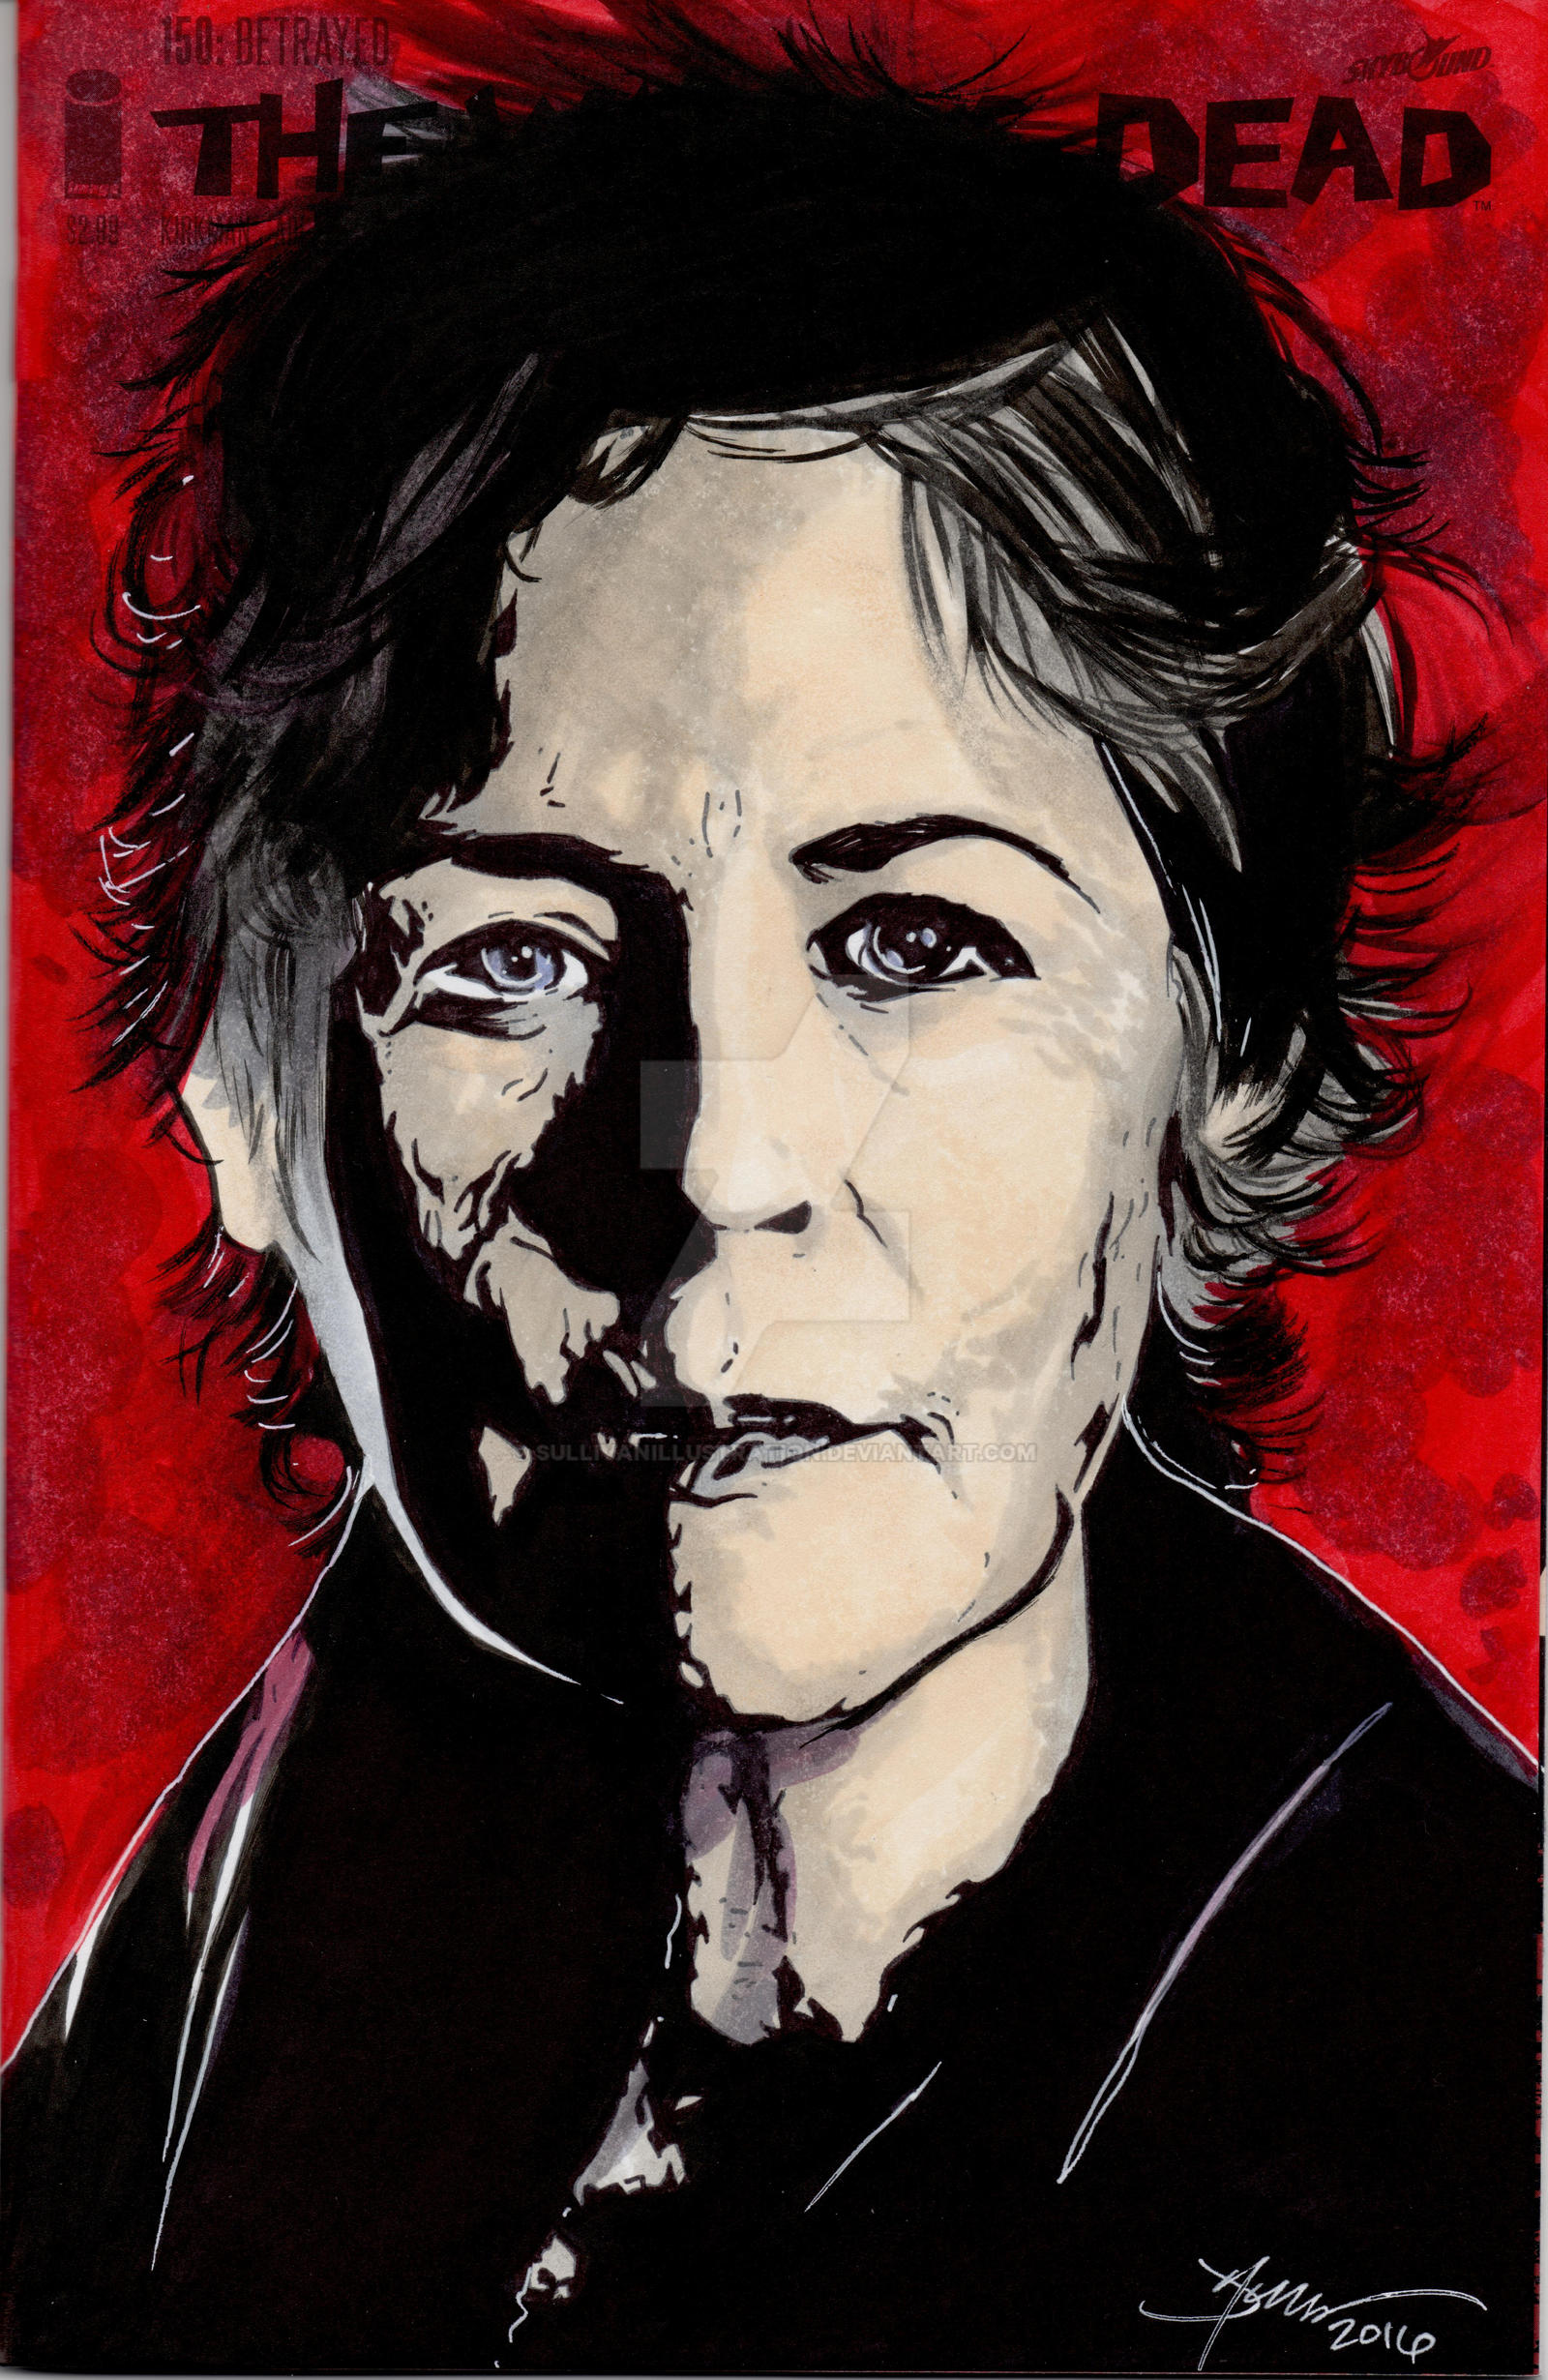 Walking Dead Carol Hand Drawn Sketch Cover by sullivanillustration